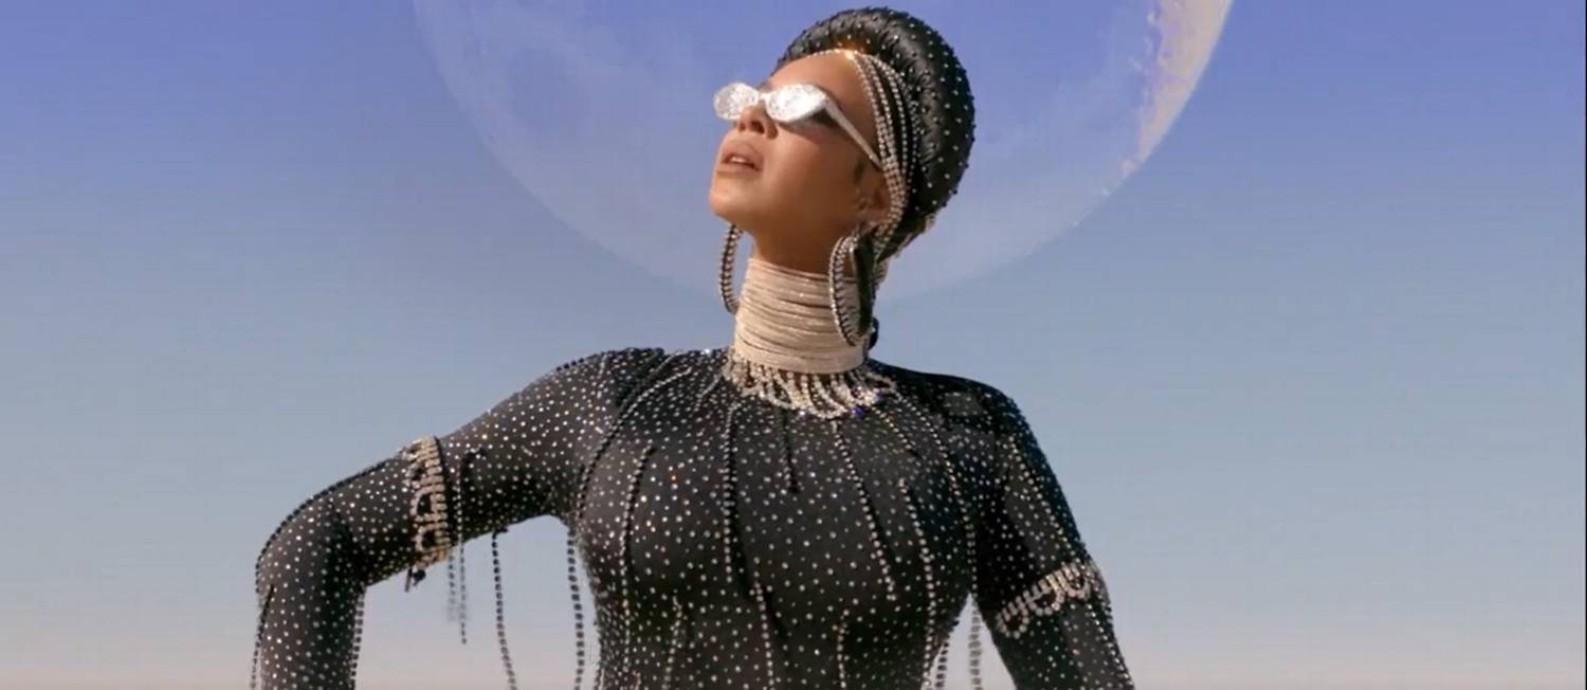 Filme de Beyoncé levanta críticas e elogios, entenda o caso